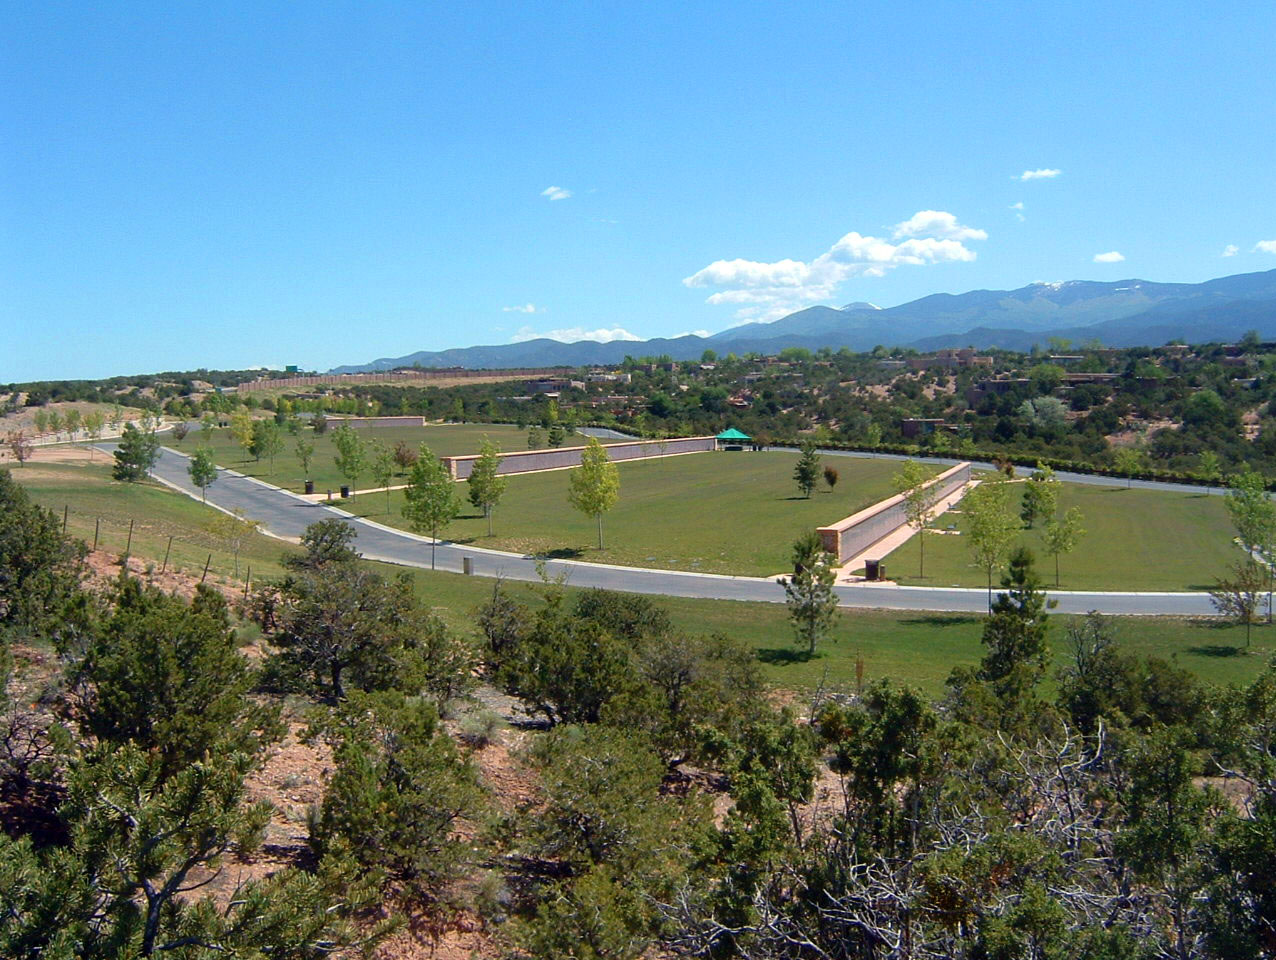 Santa Fe National Cemetery Columbarium Fields